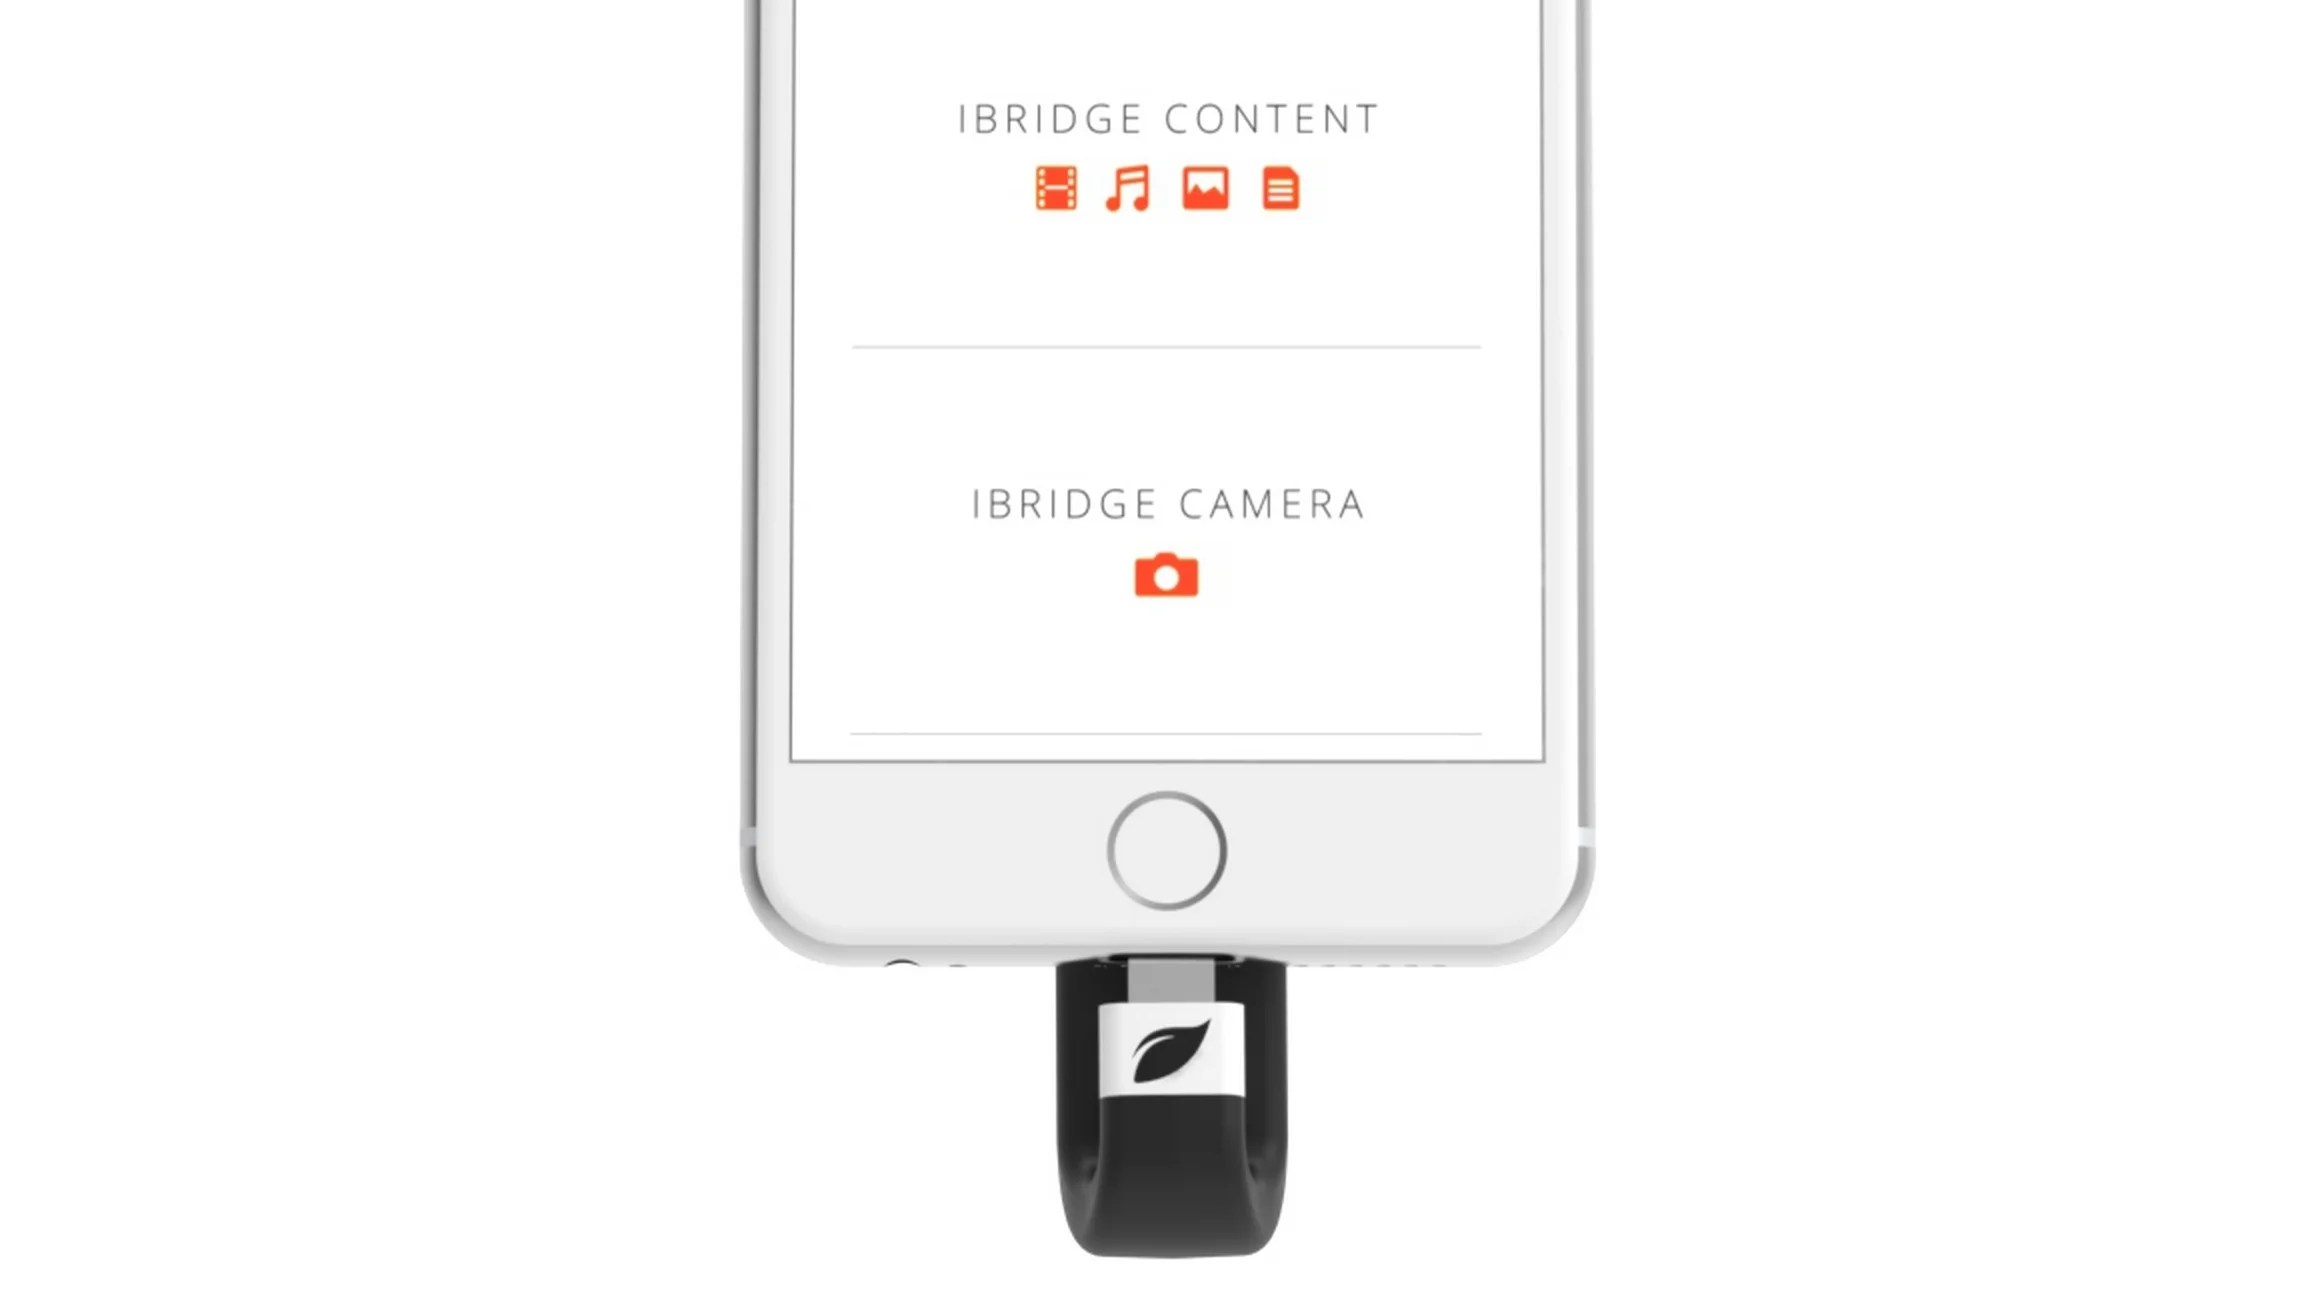 Who Needs Usb Otg Leef Ibridge Uses Lightning Adapter For